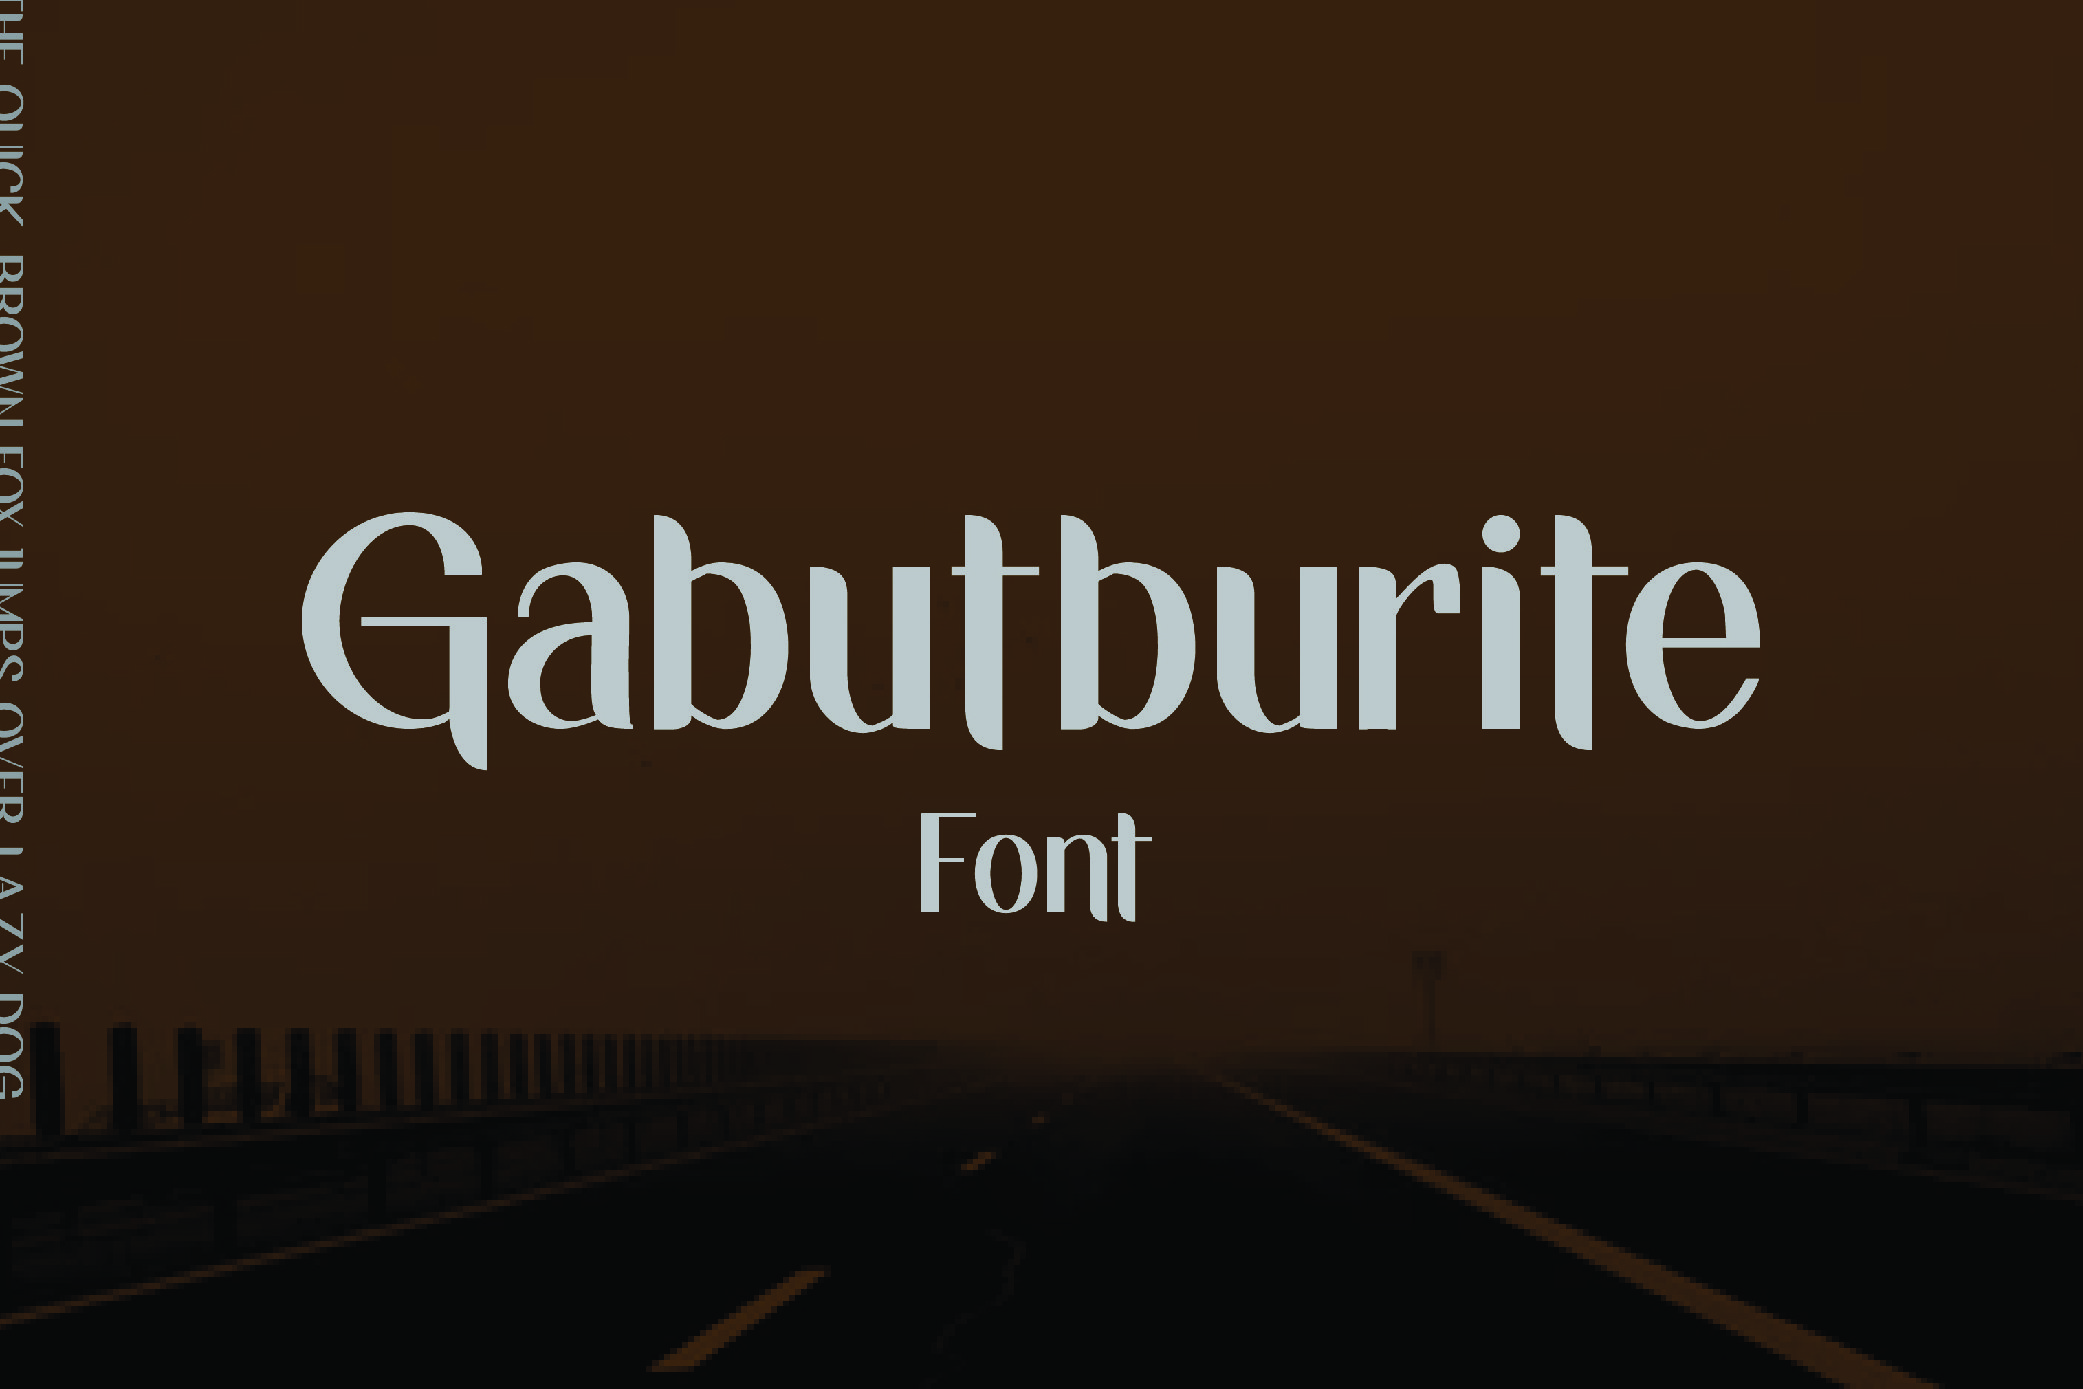 Gabutburit example image 1